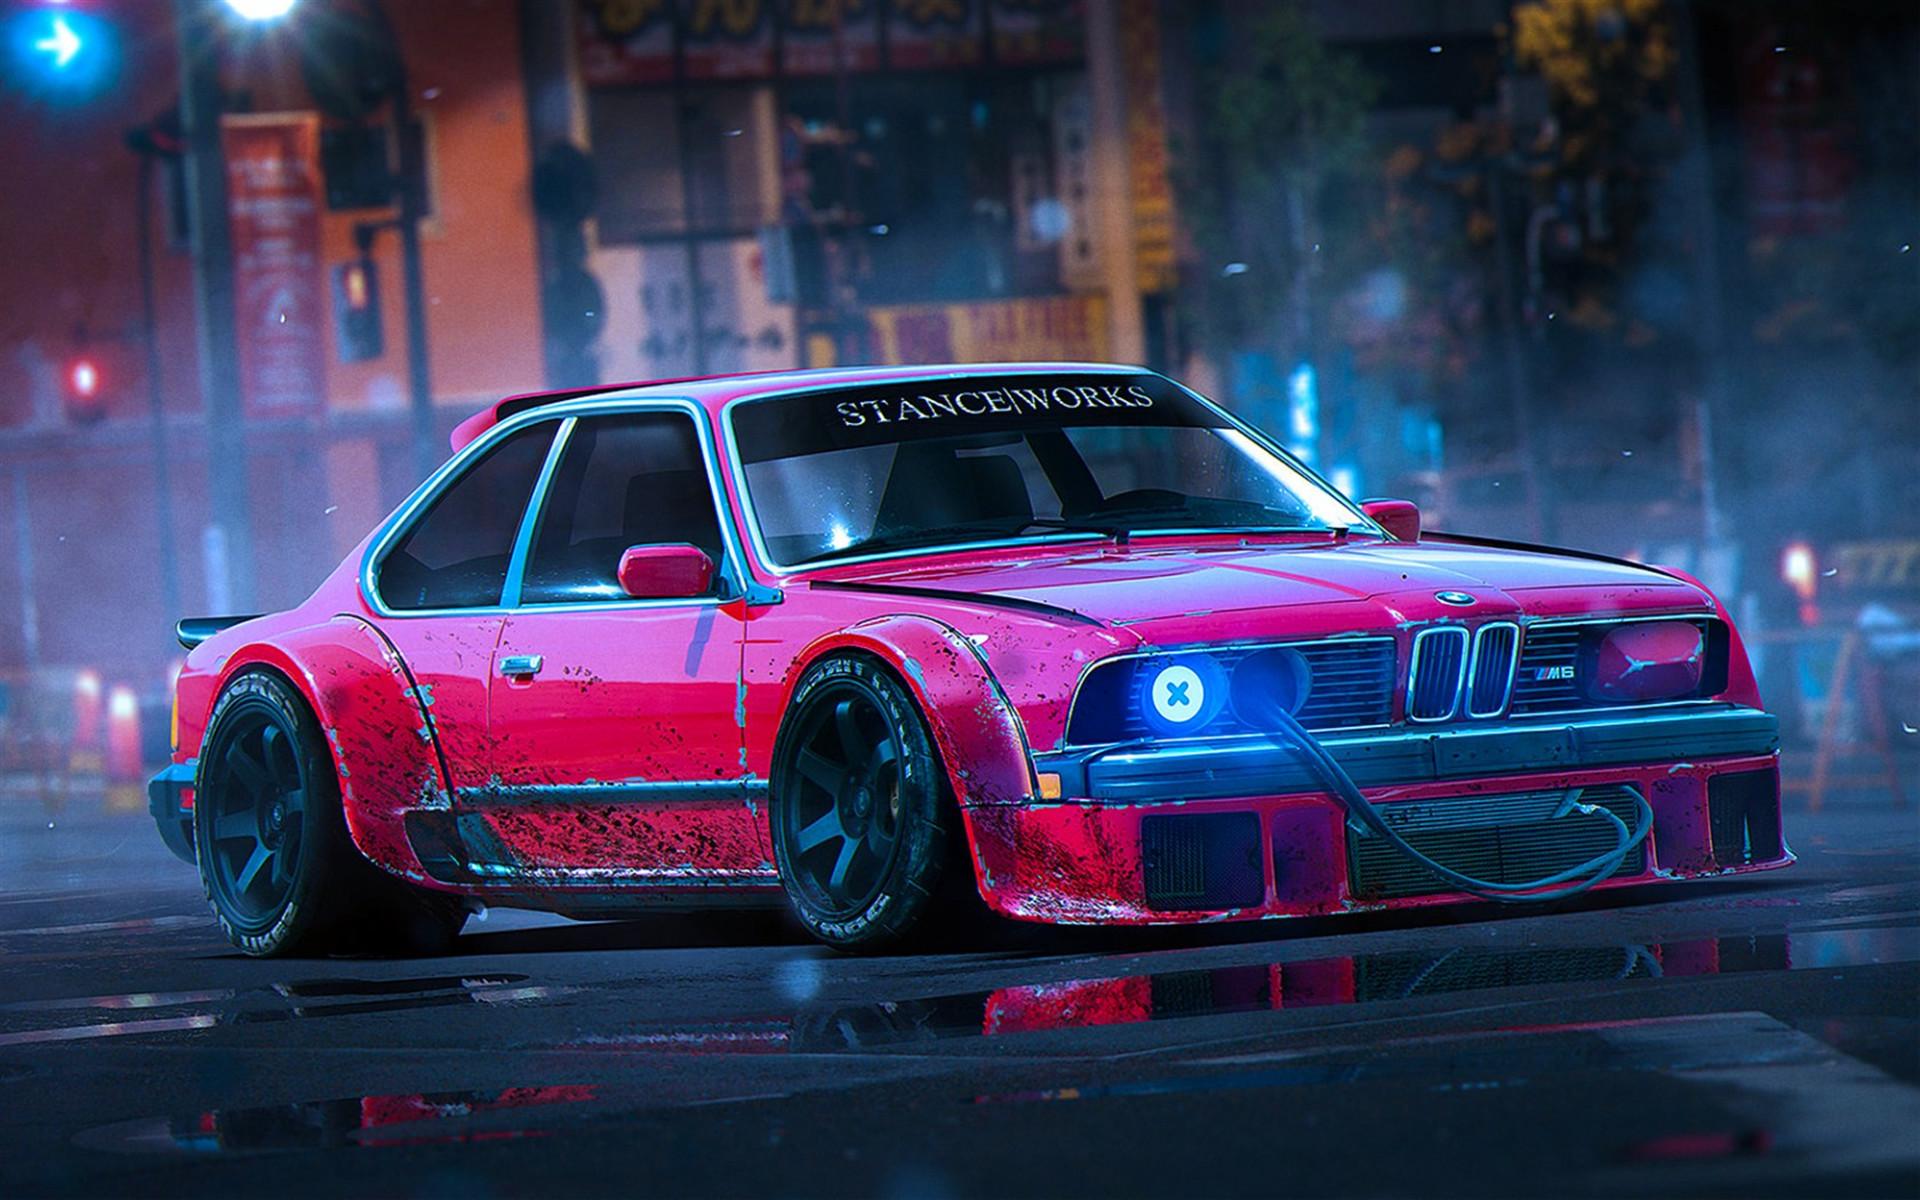 Res: 1920x1200, BMW M6, E24, stance, art, tuning, night, BMW